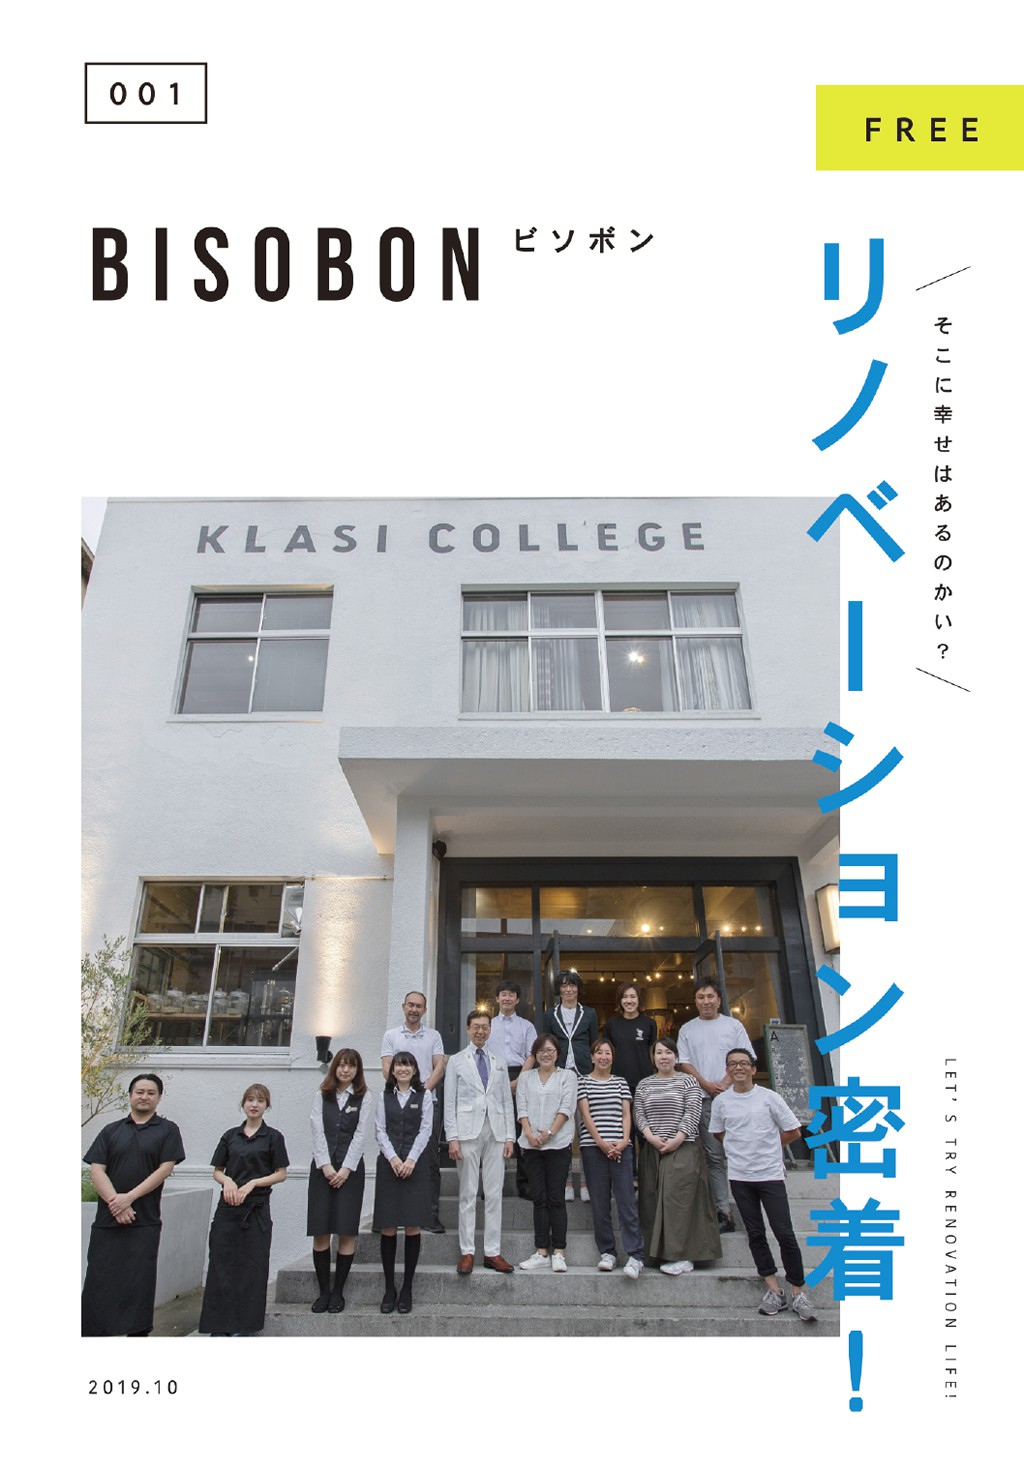 BISOBON 001 BISOBON